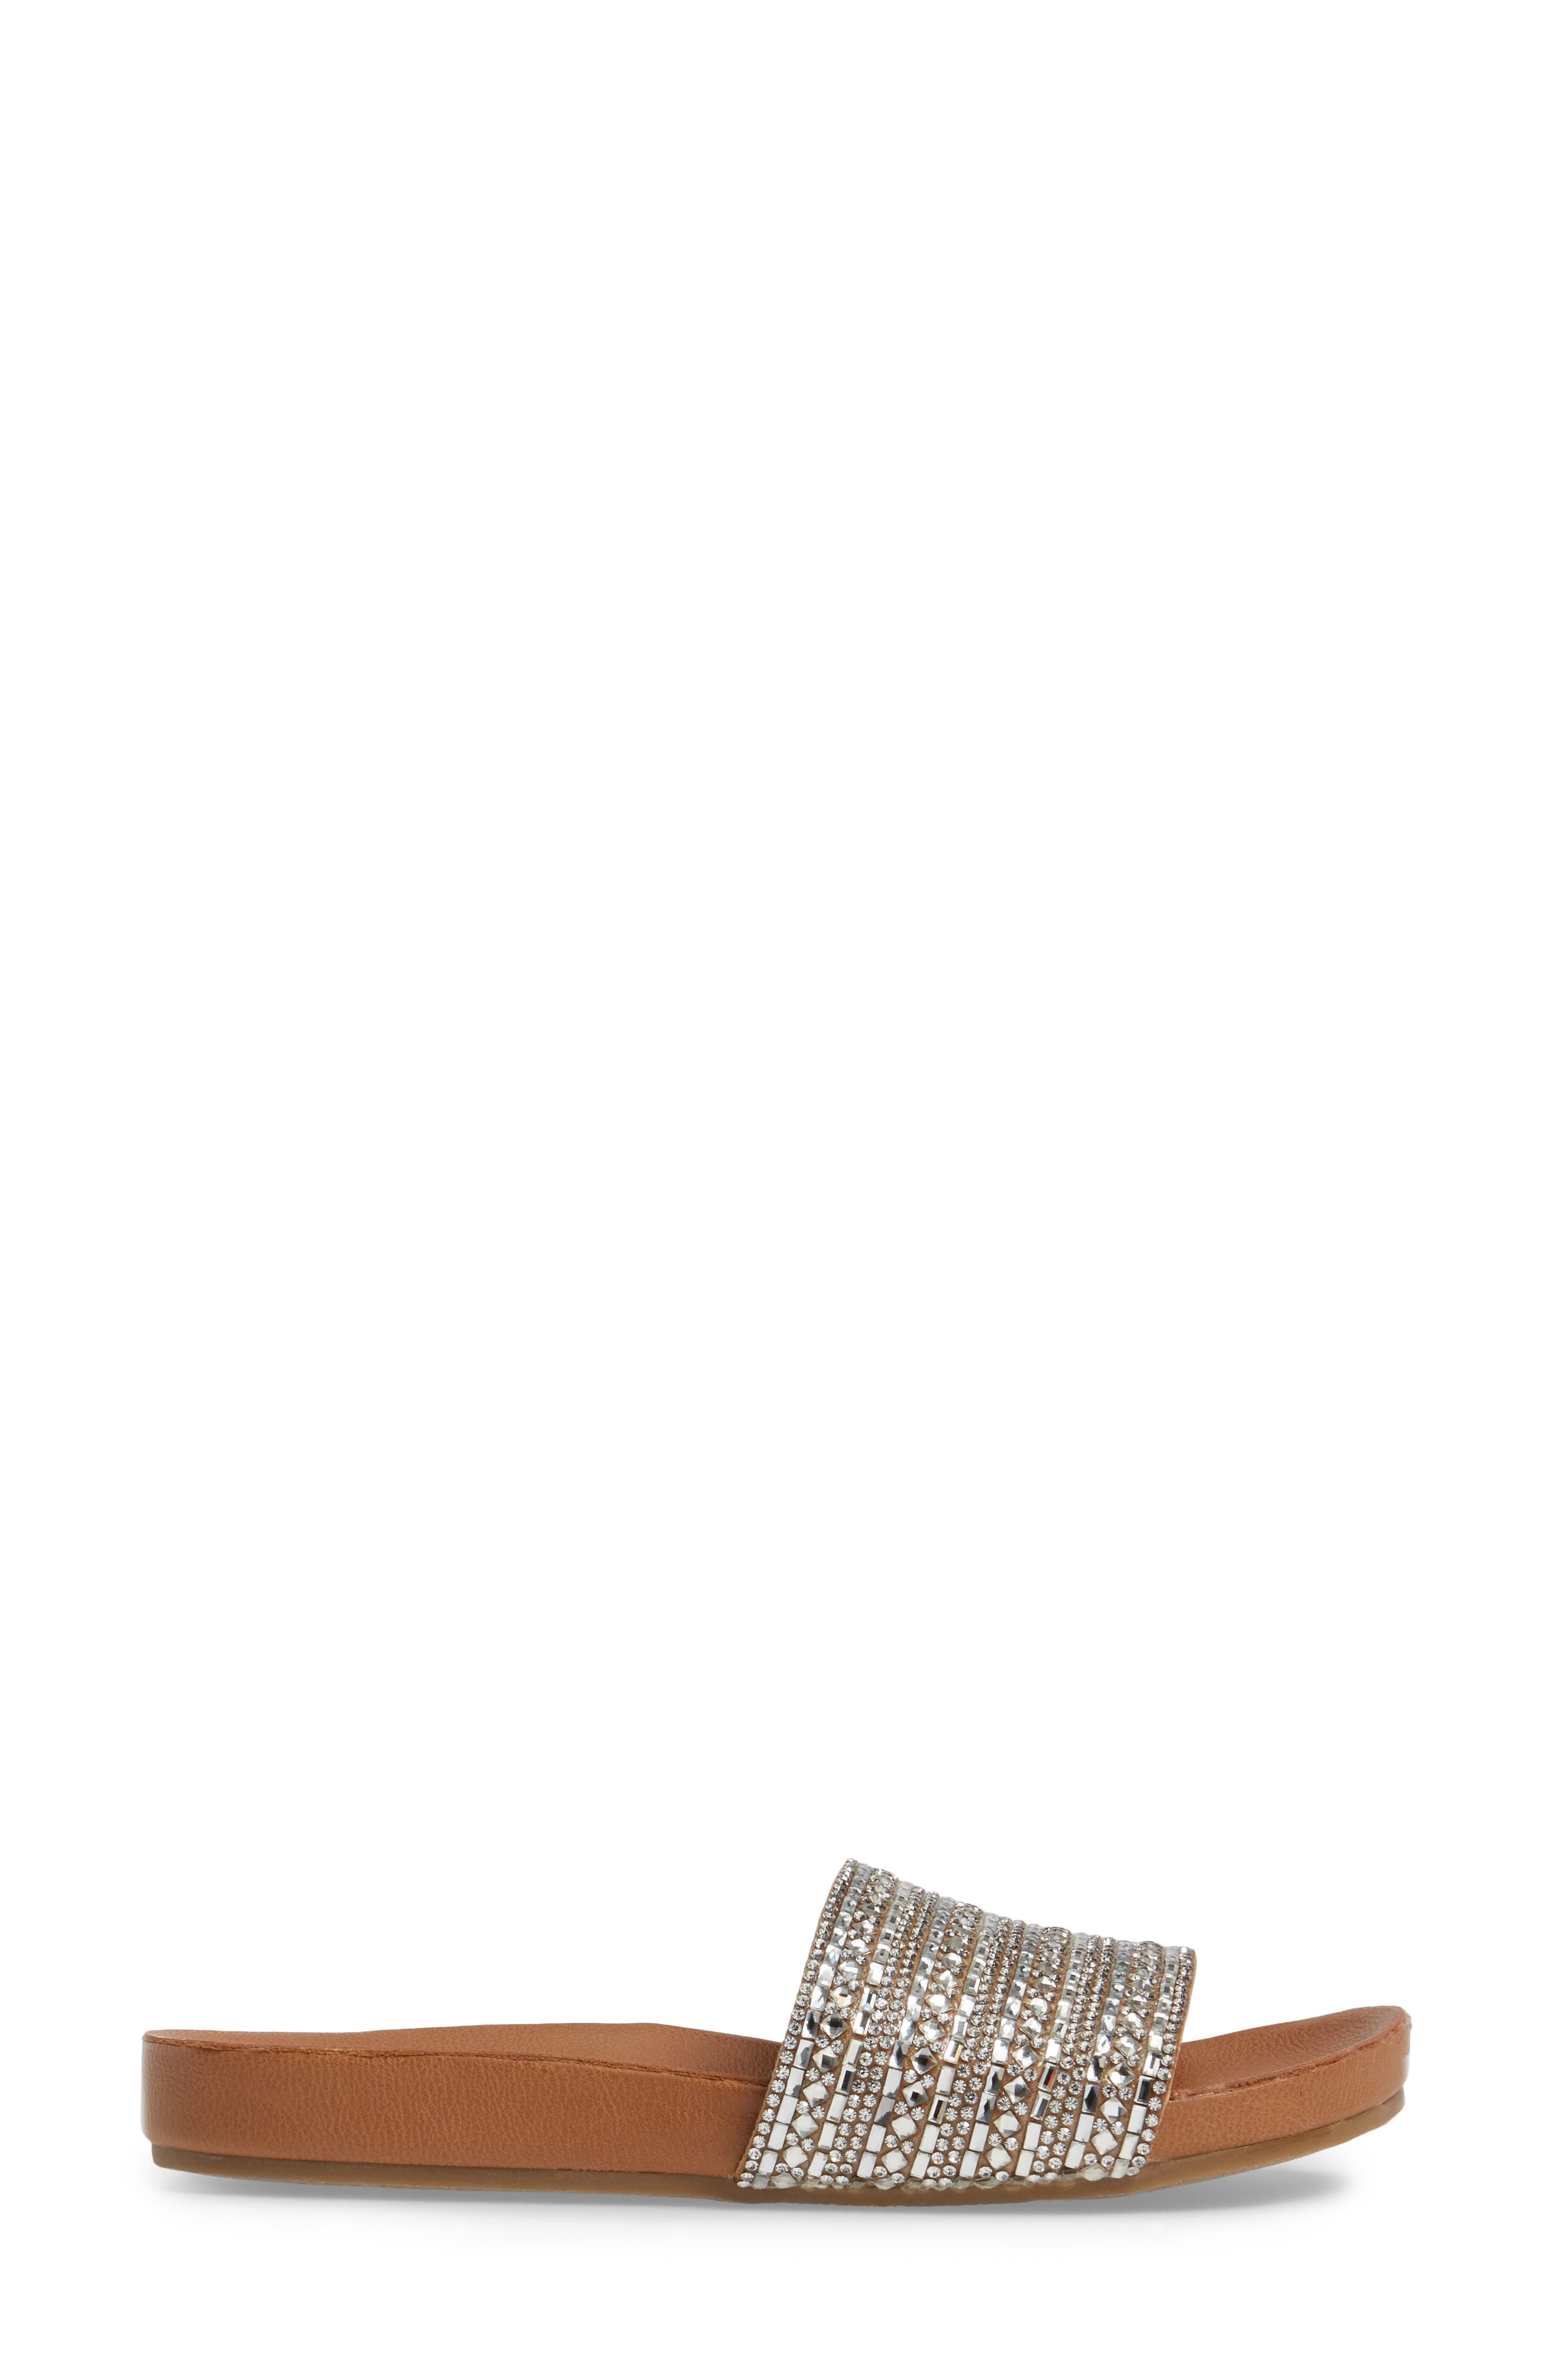 Dazzle Embellished Slide Sandal,                             Alternate thumbnail 3, color,                             Rhinestone